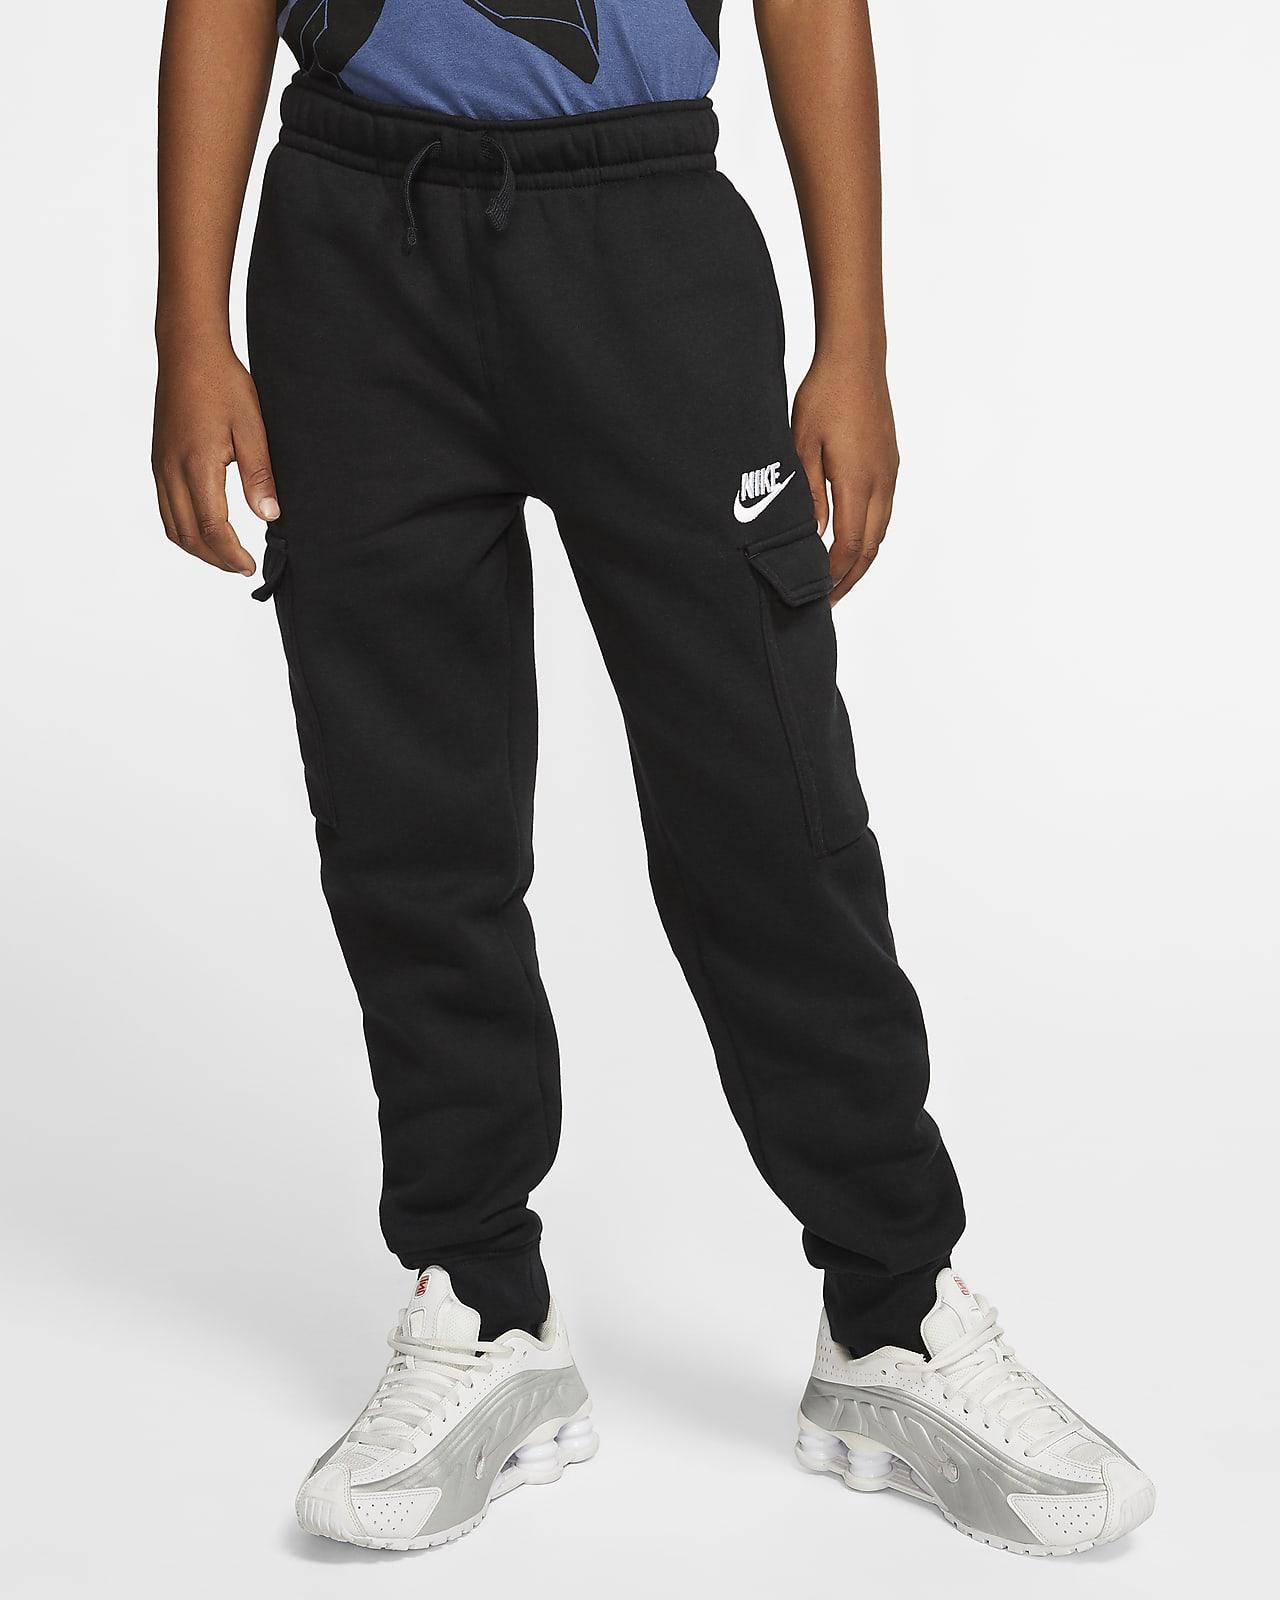 Cargobyxor Nike Sportswear Club för killar